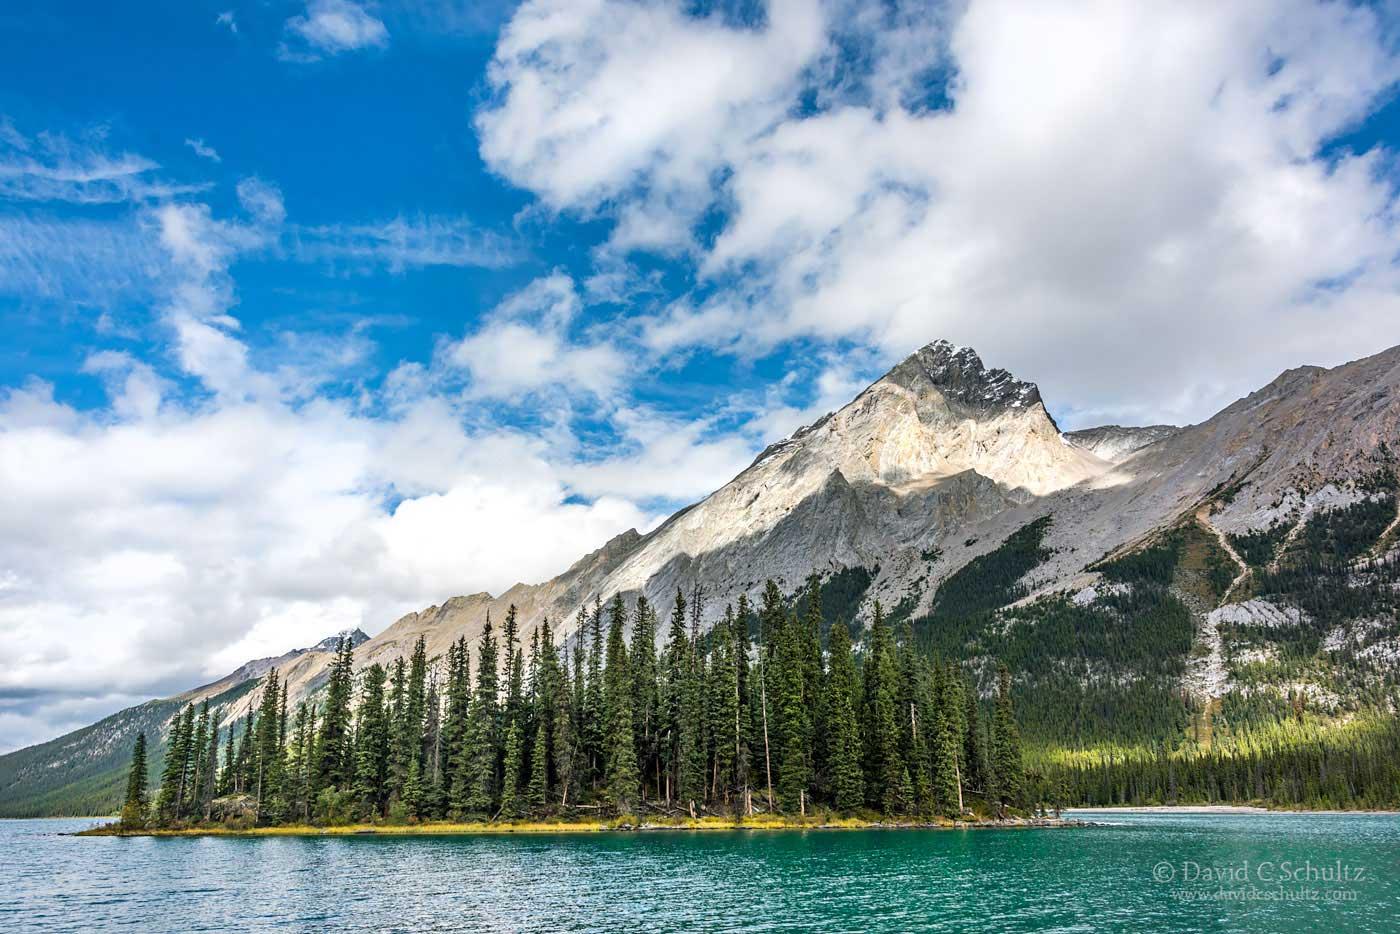 Maligne Lake, Jasper National Park, Canada - Image #125-594